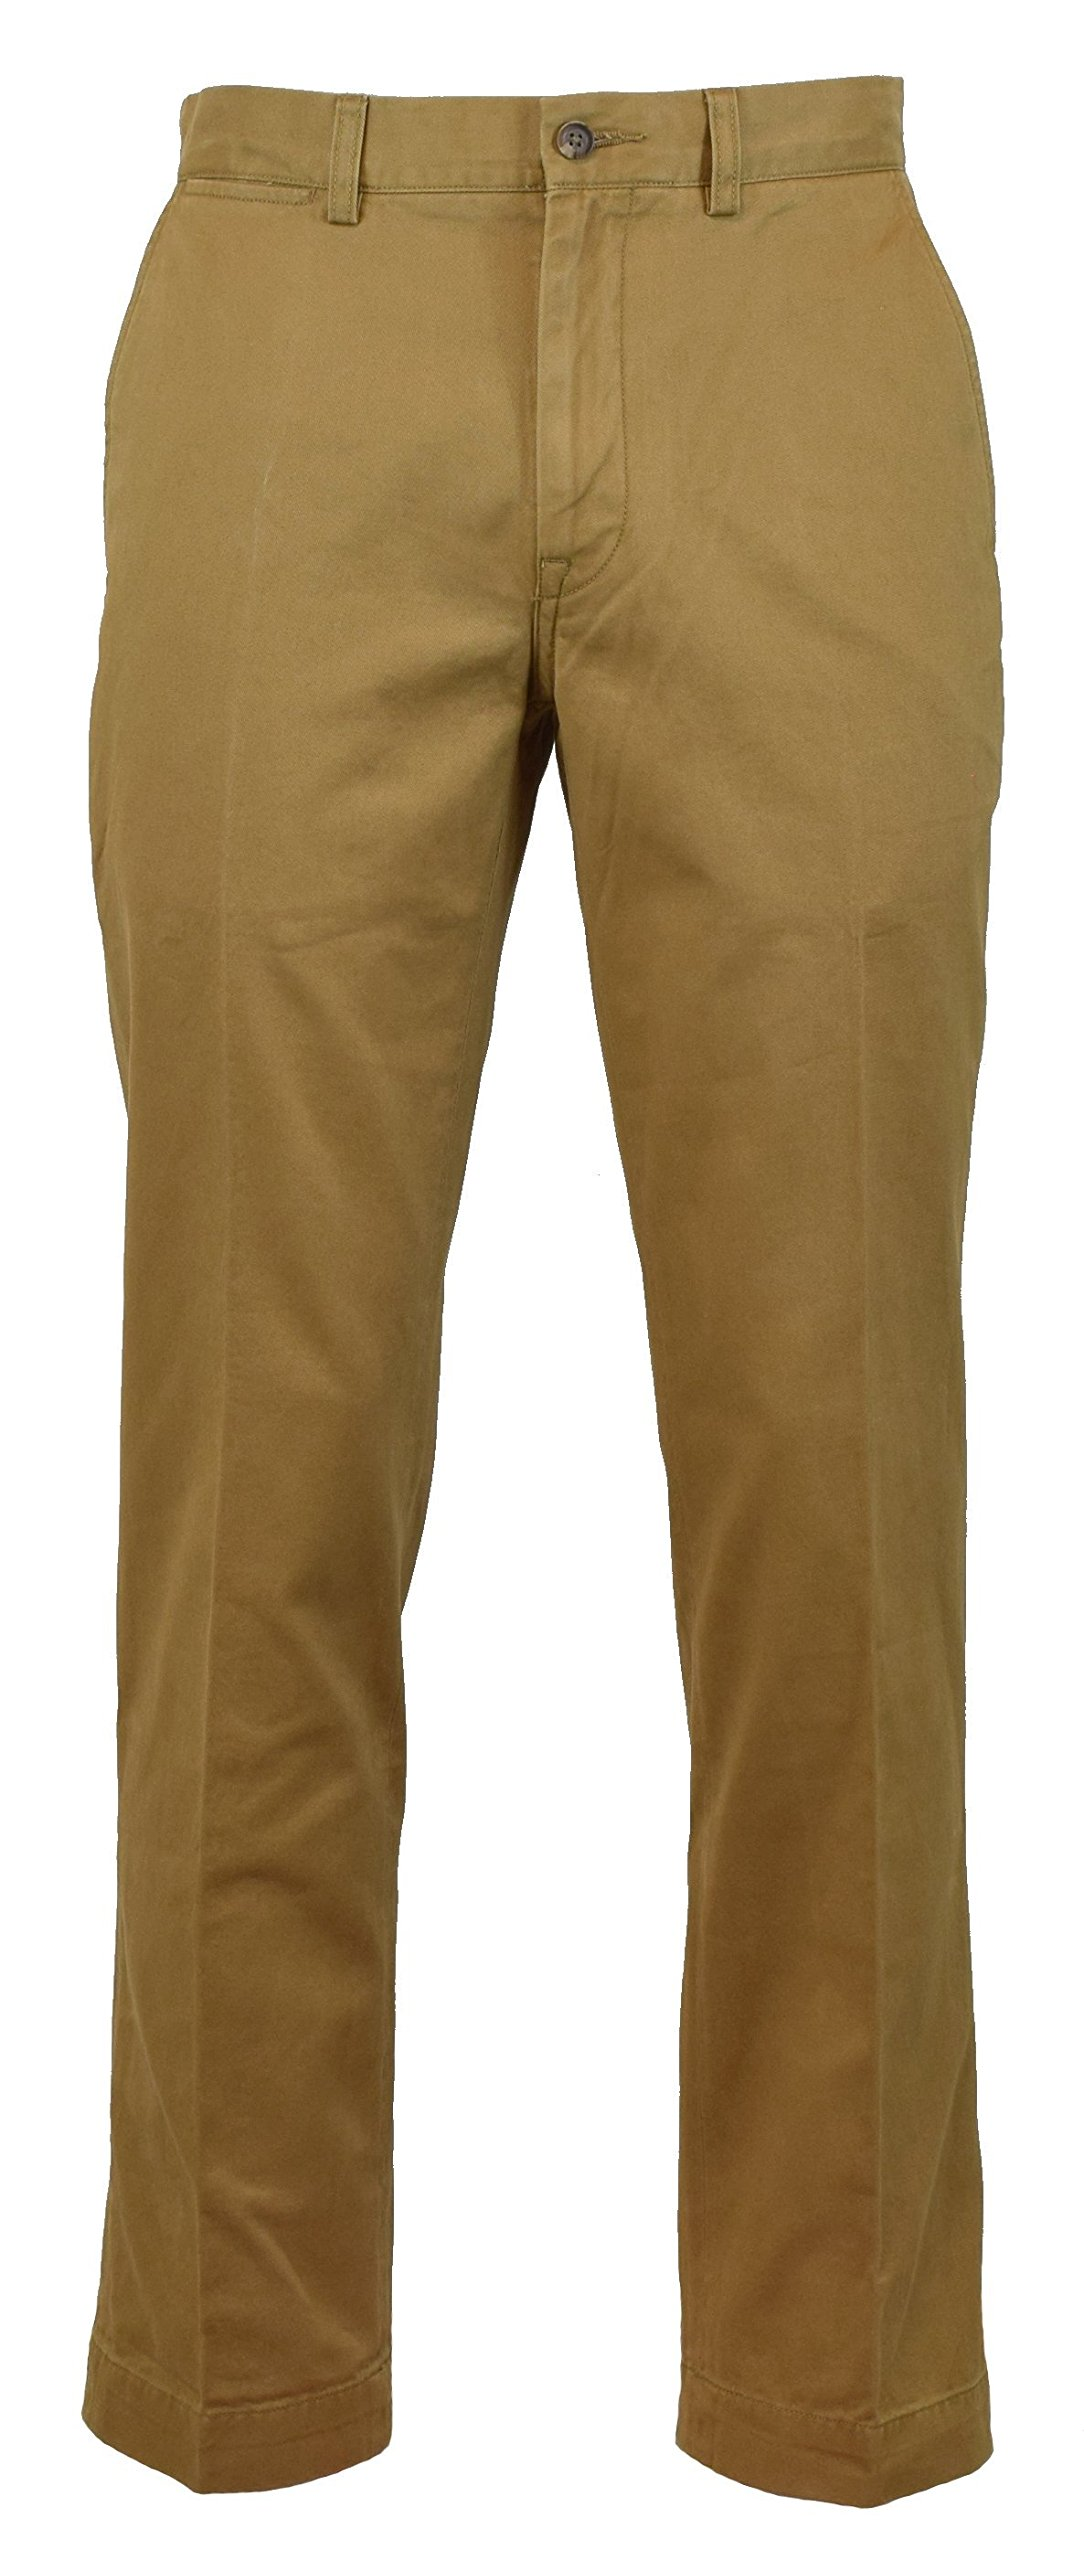 RALPH LAUREN Polo Mens Classic Fit Flat Front Chino Pants (Ghurka, 31x32)